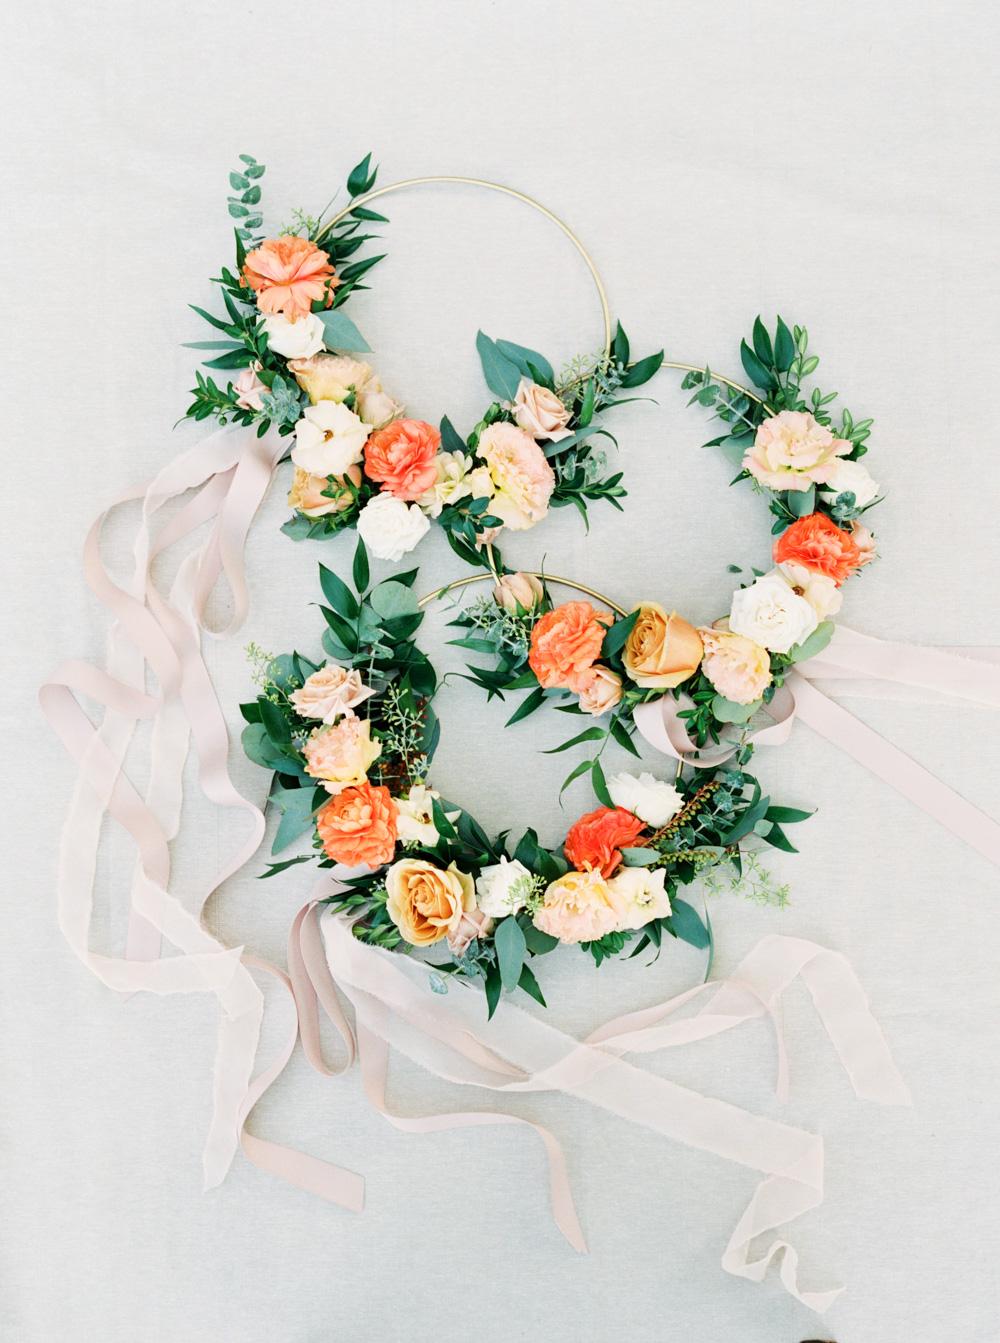 vineyard-bride-vendor-spotlight-lush-florals-and-events-niagara-wedding-florist-vendors-toronto-southern-ontario001.jpg